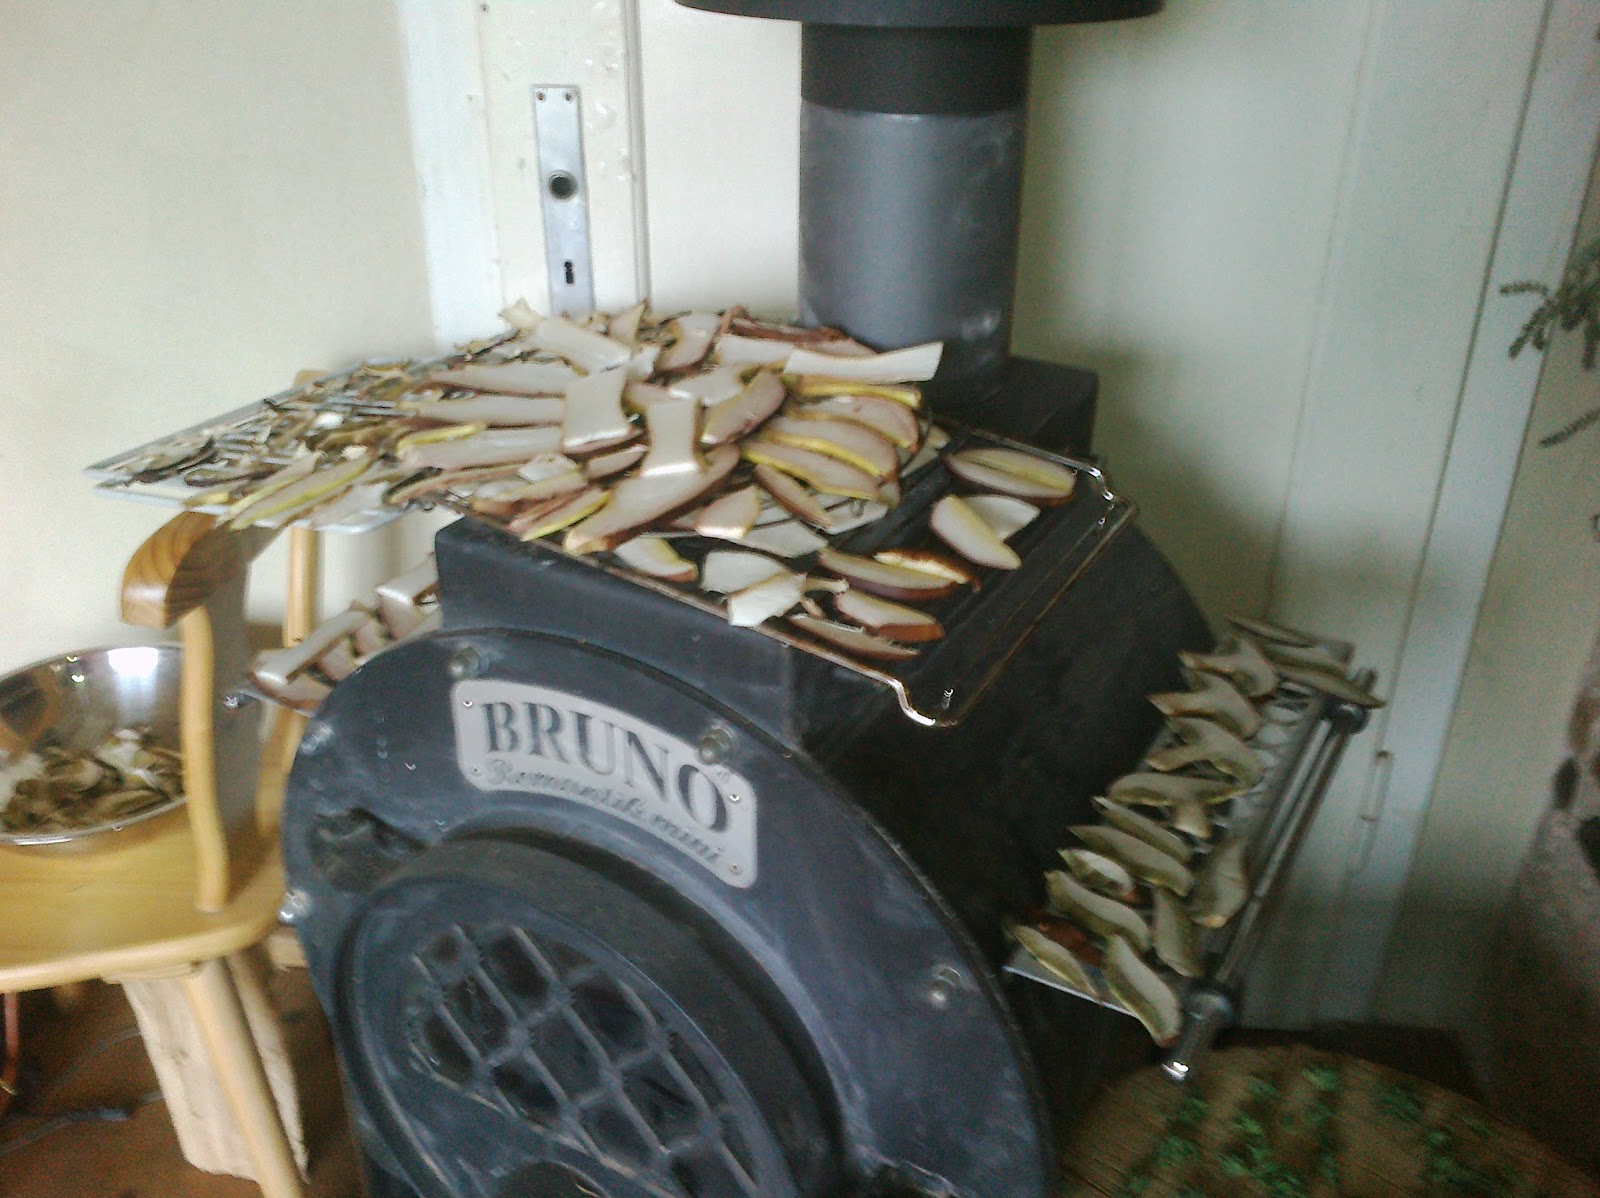 kalkhydrat einsumpfen mischungsverh ltnis zement. Black Bedroom Furniture Sets. Home Design Ideas